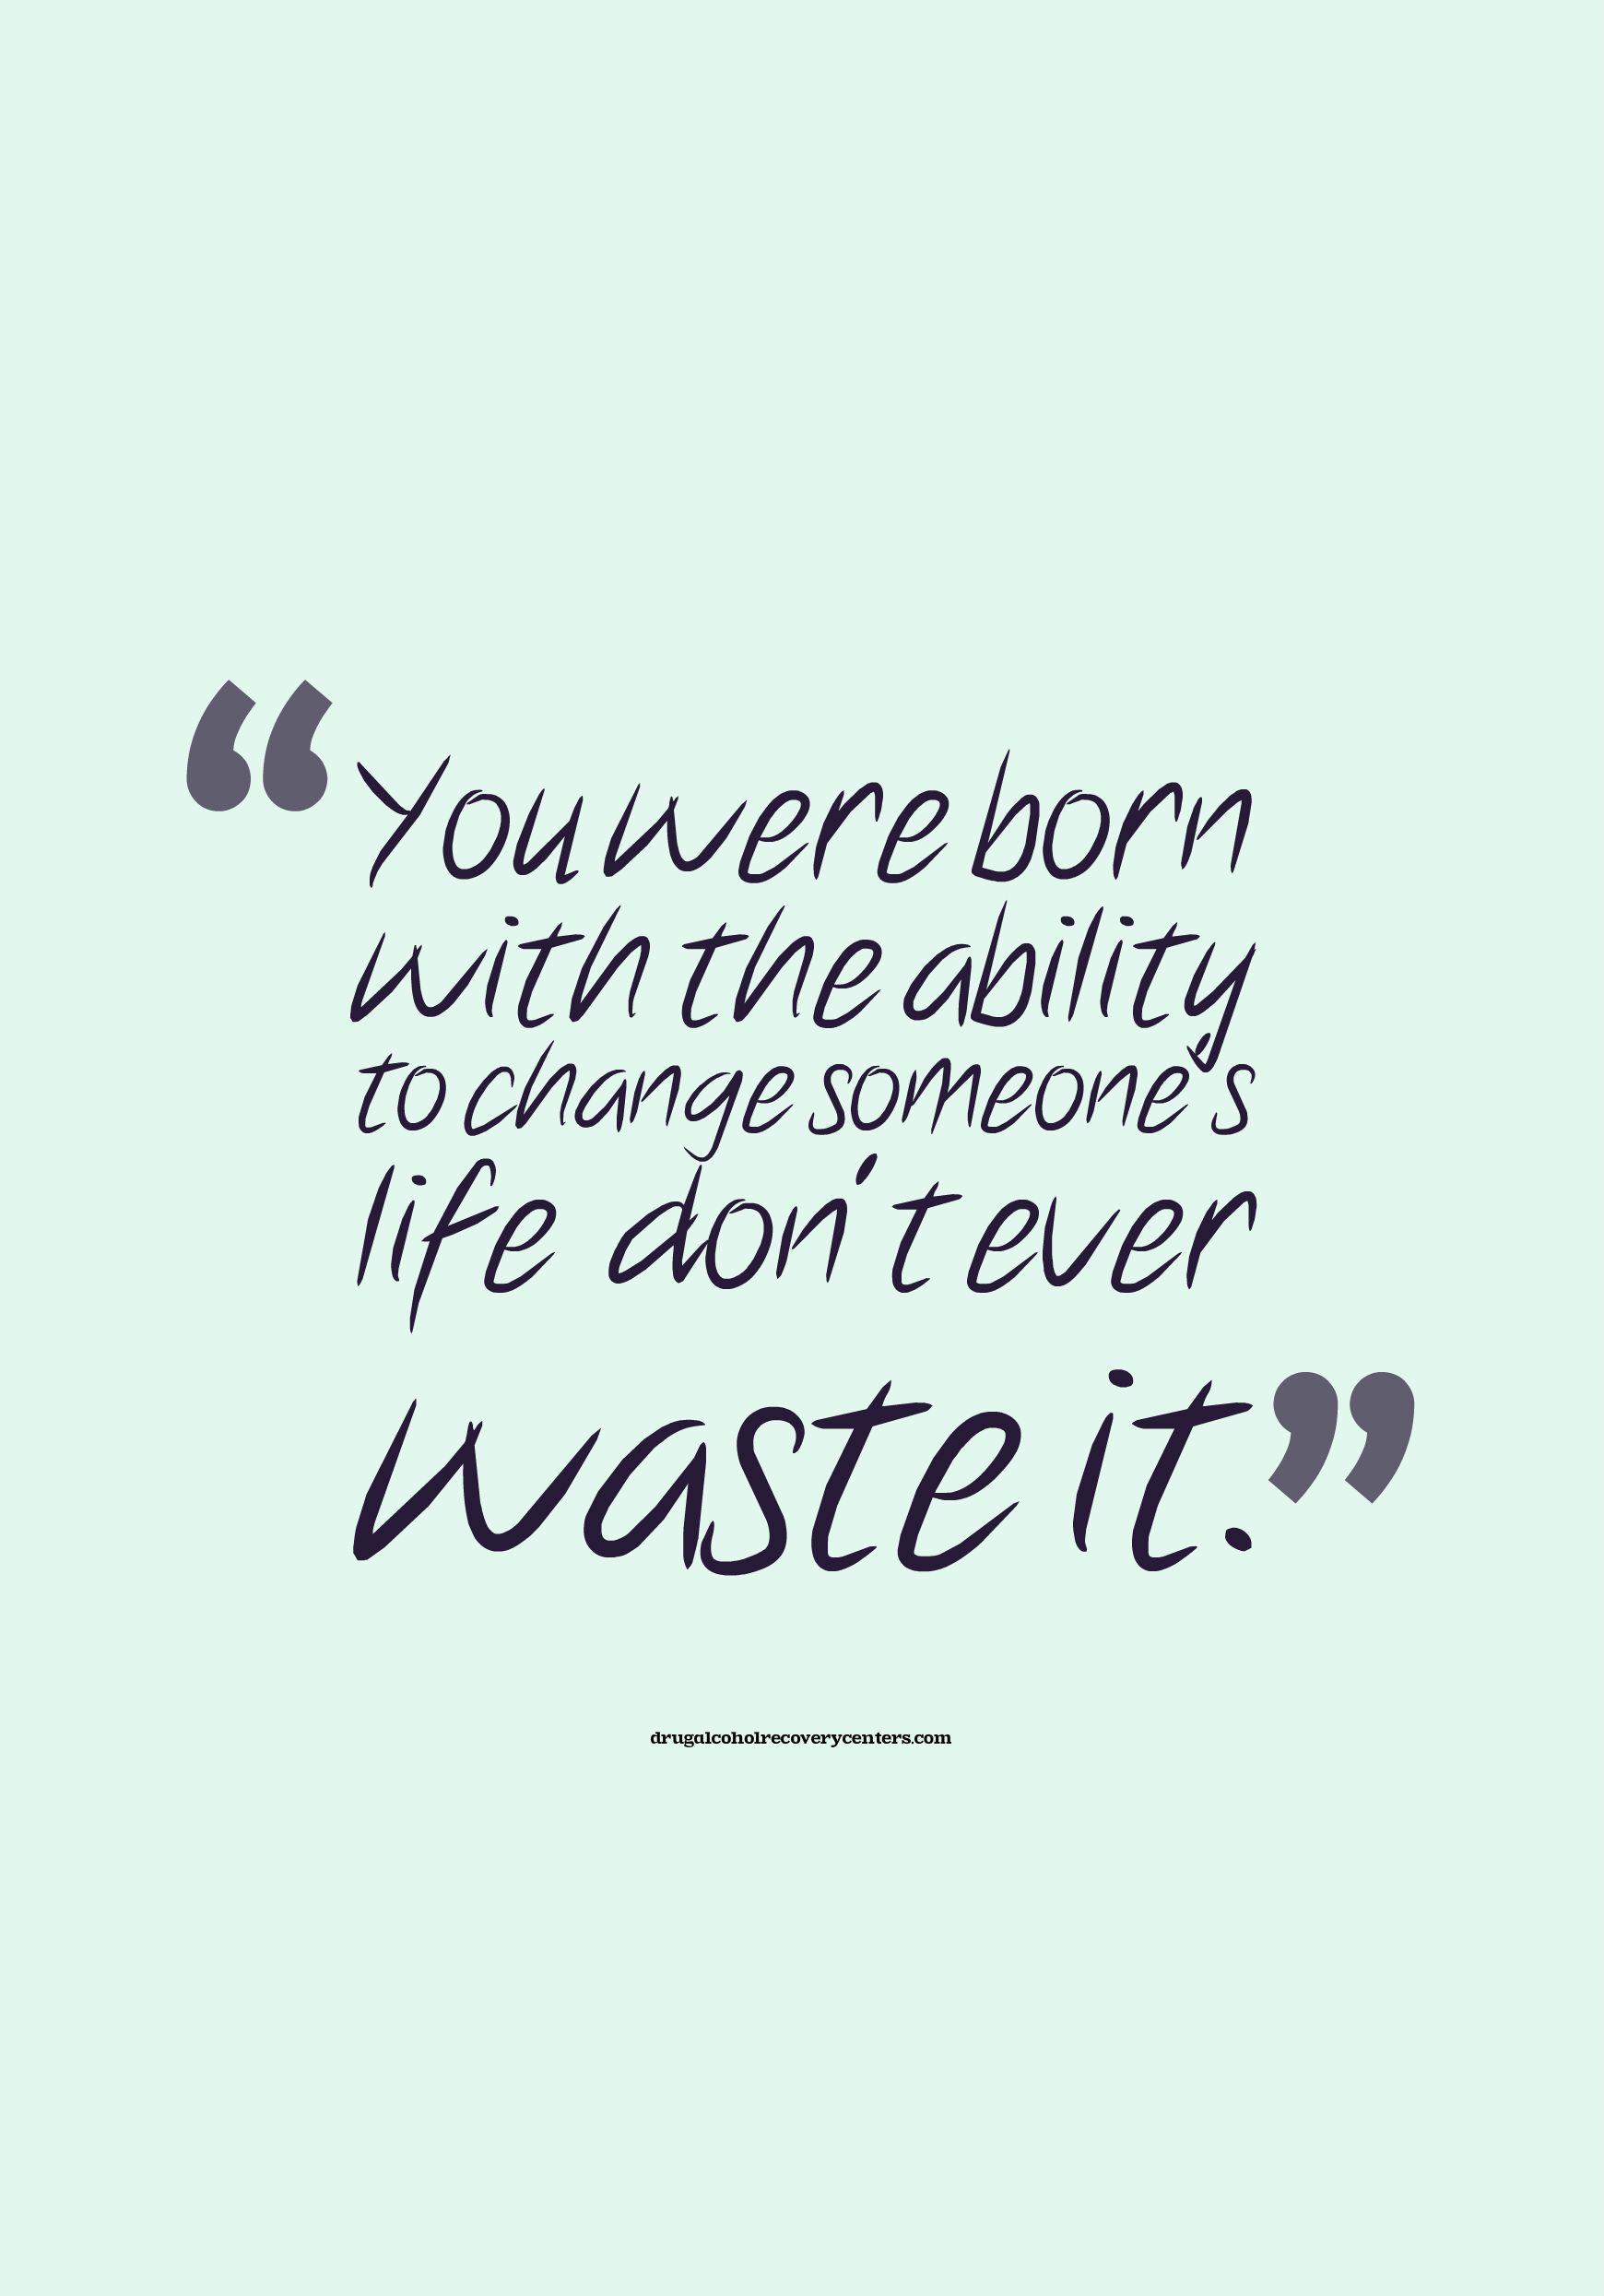 Motivational Quote Don't waste it! Follow https//www